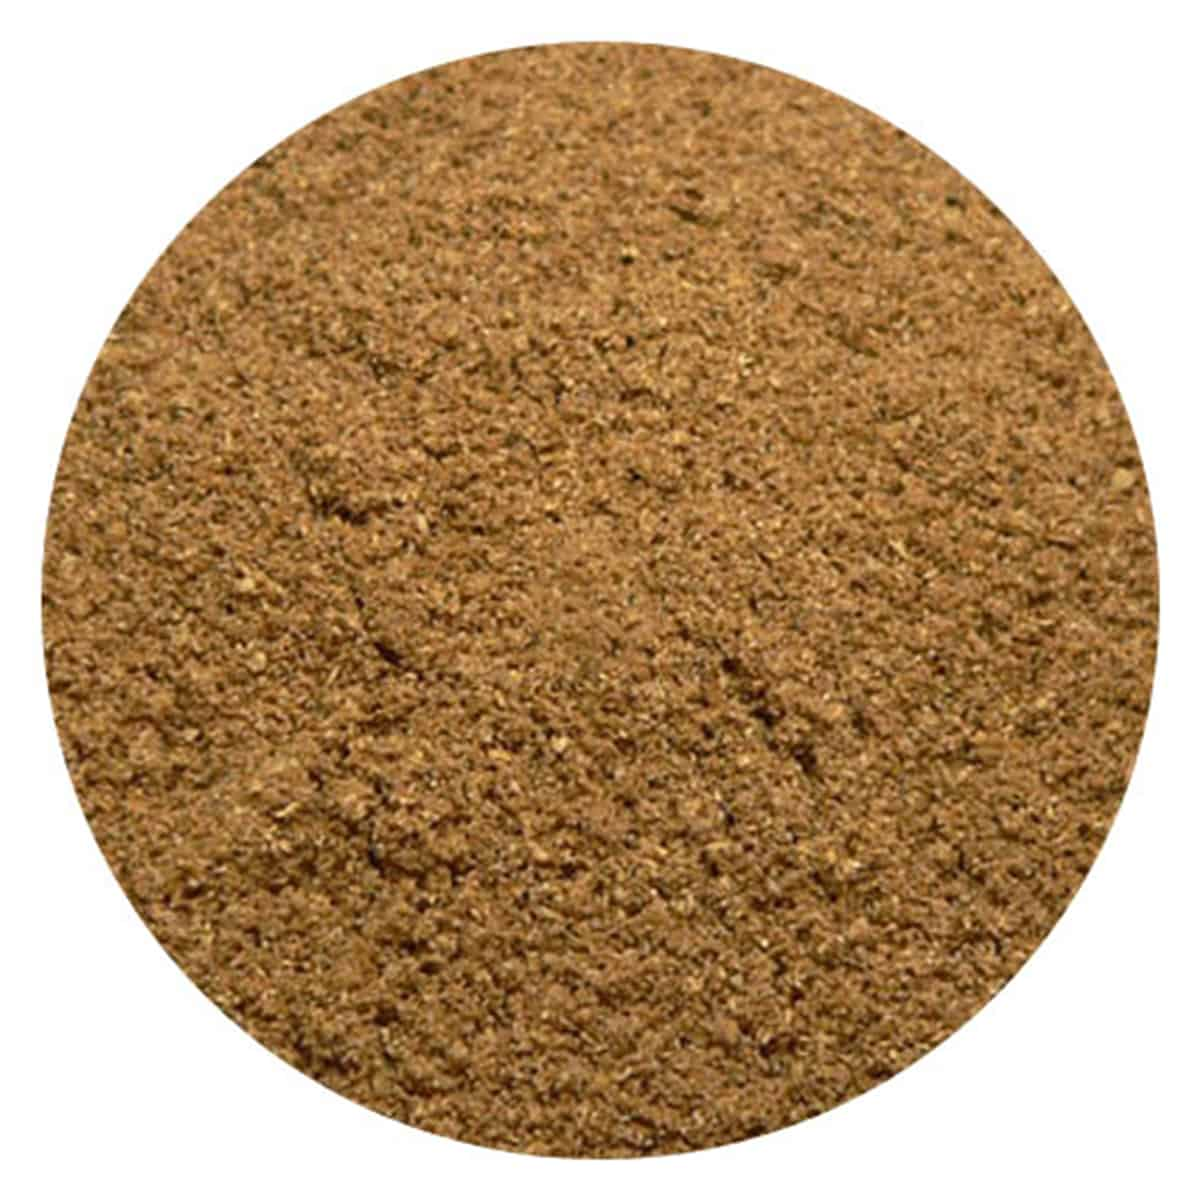 Buy IAG Foods Coriander Powder - 1 kg